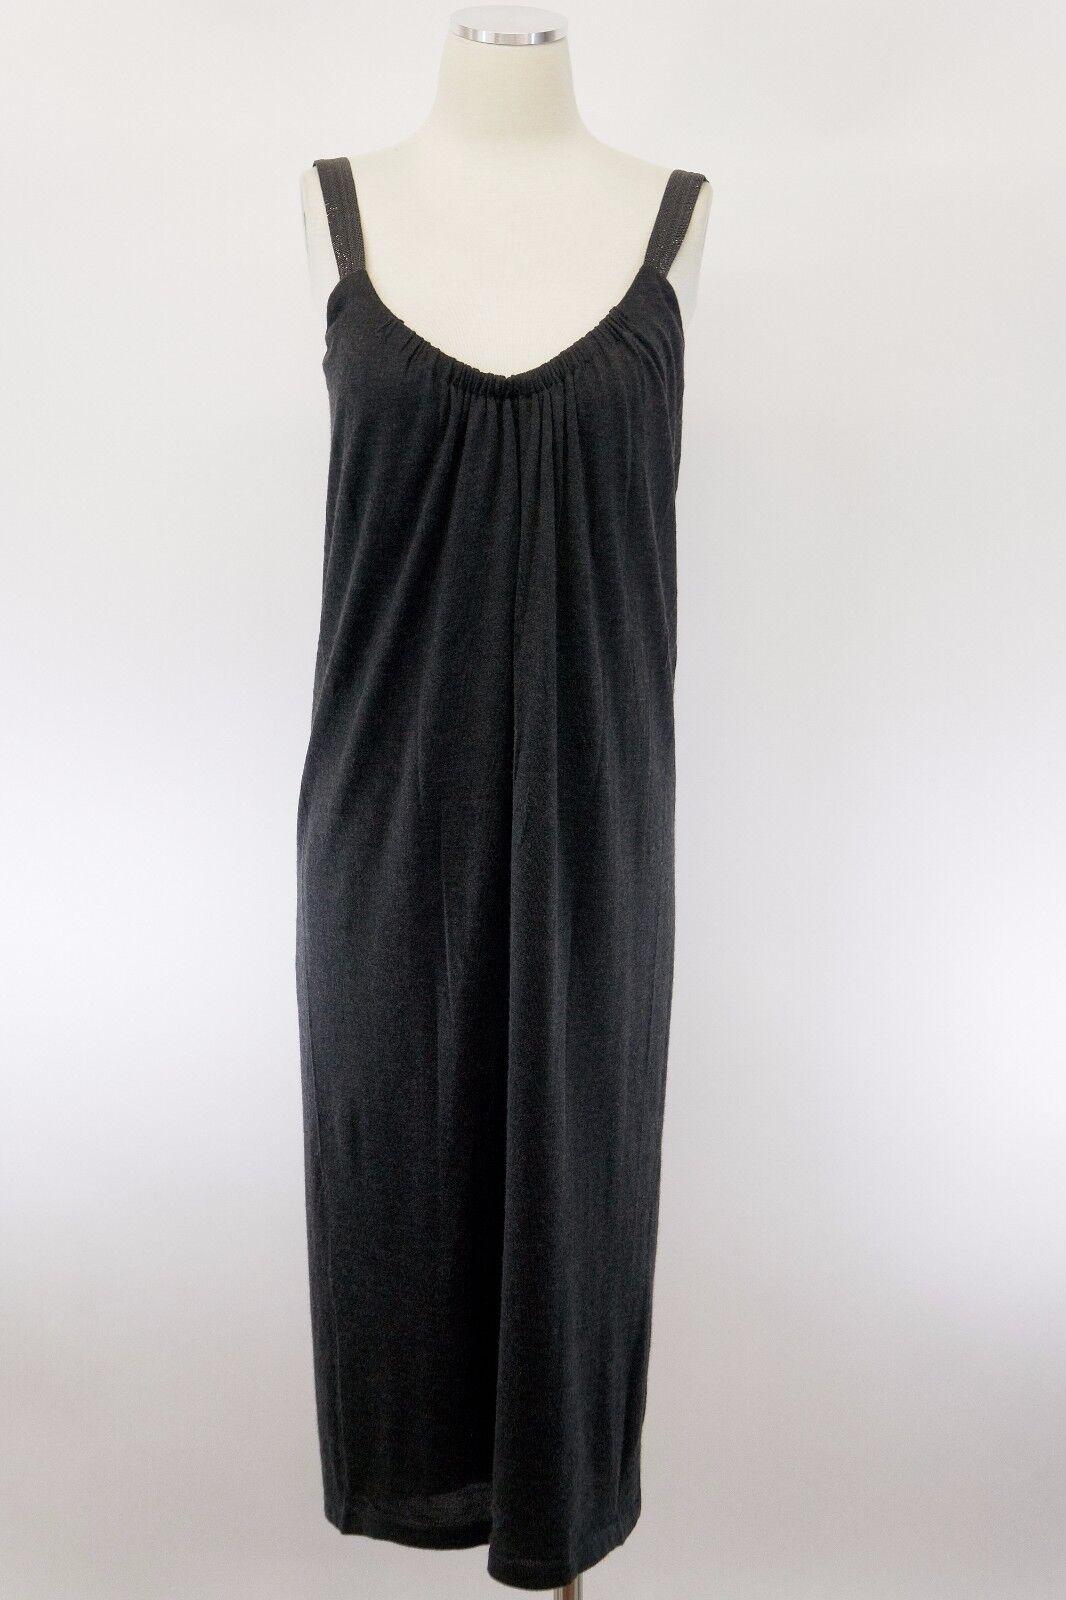 2b5d56cf NWOT 2475 Brunello Cucinelli Sparkly Monili Strap Beaded Knit Dress Size M  A176